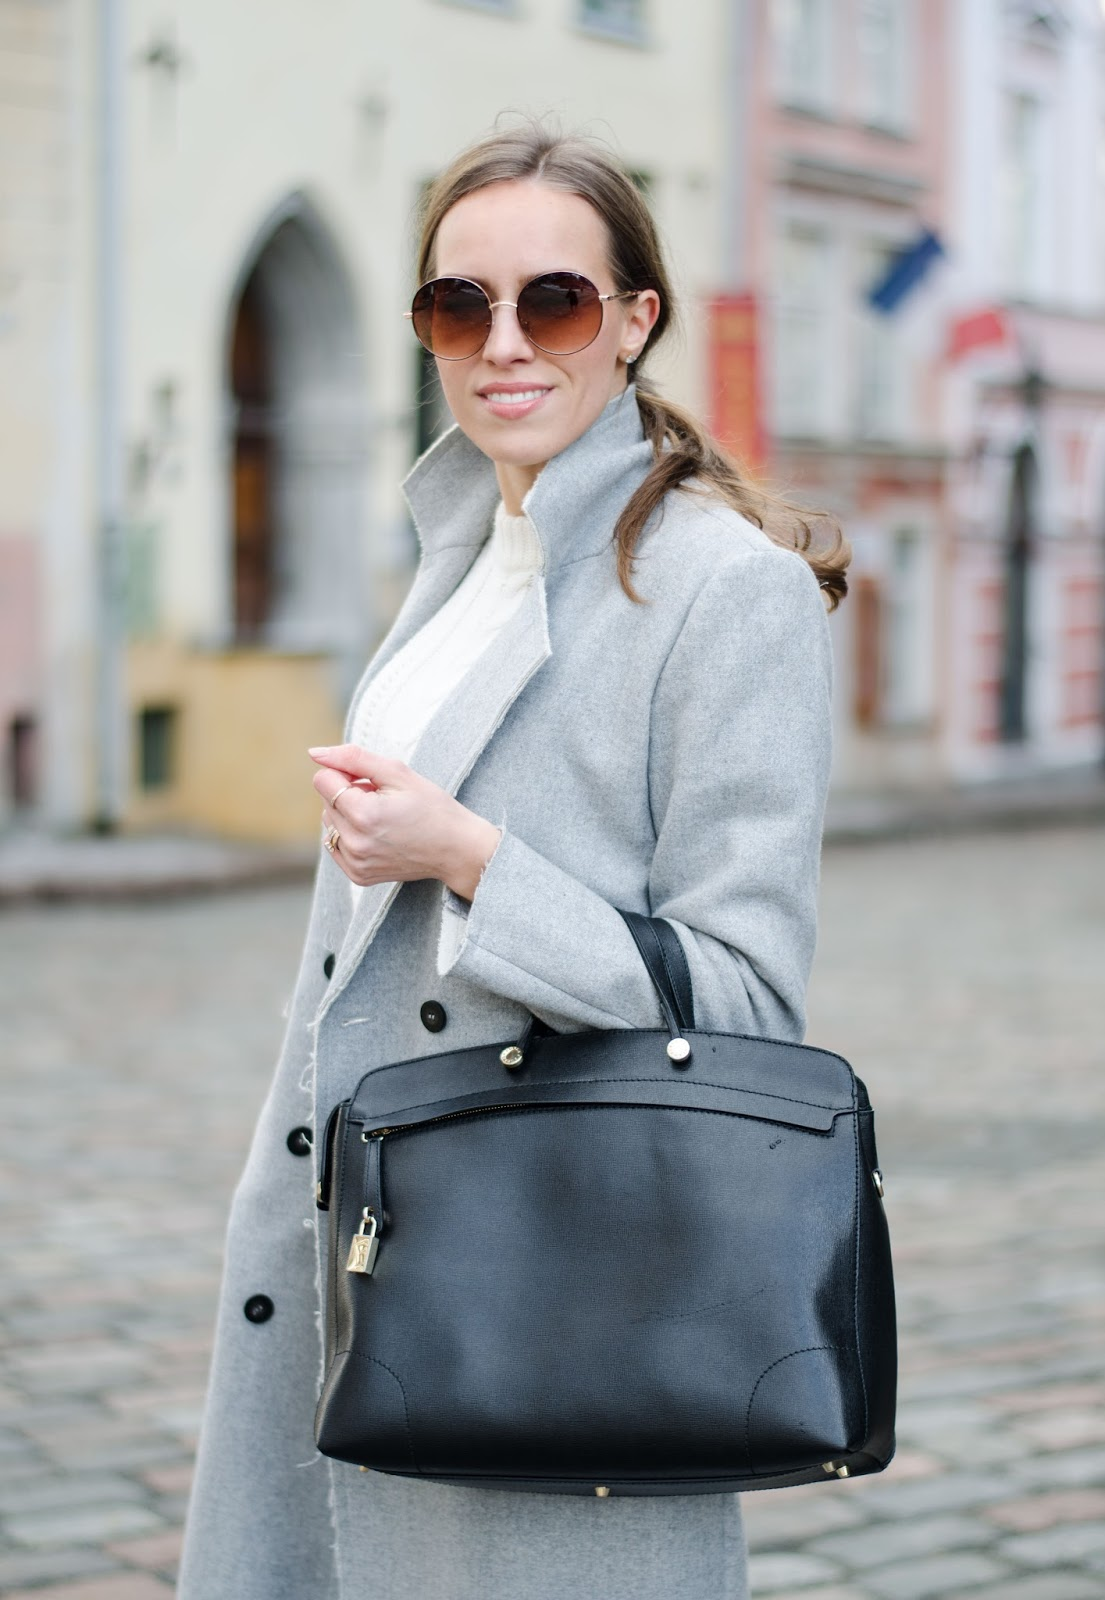 kristjaana mere vila gray wool coat lindex round sunglasses furla black leather bag